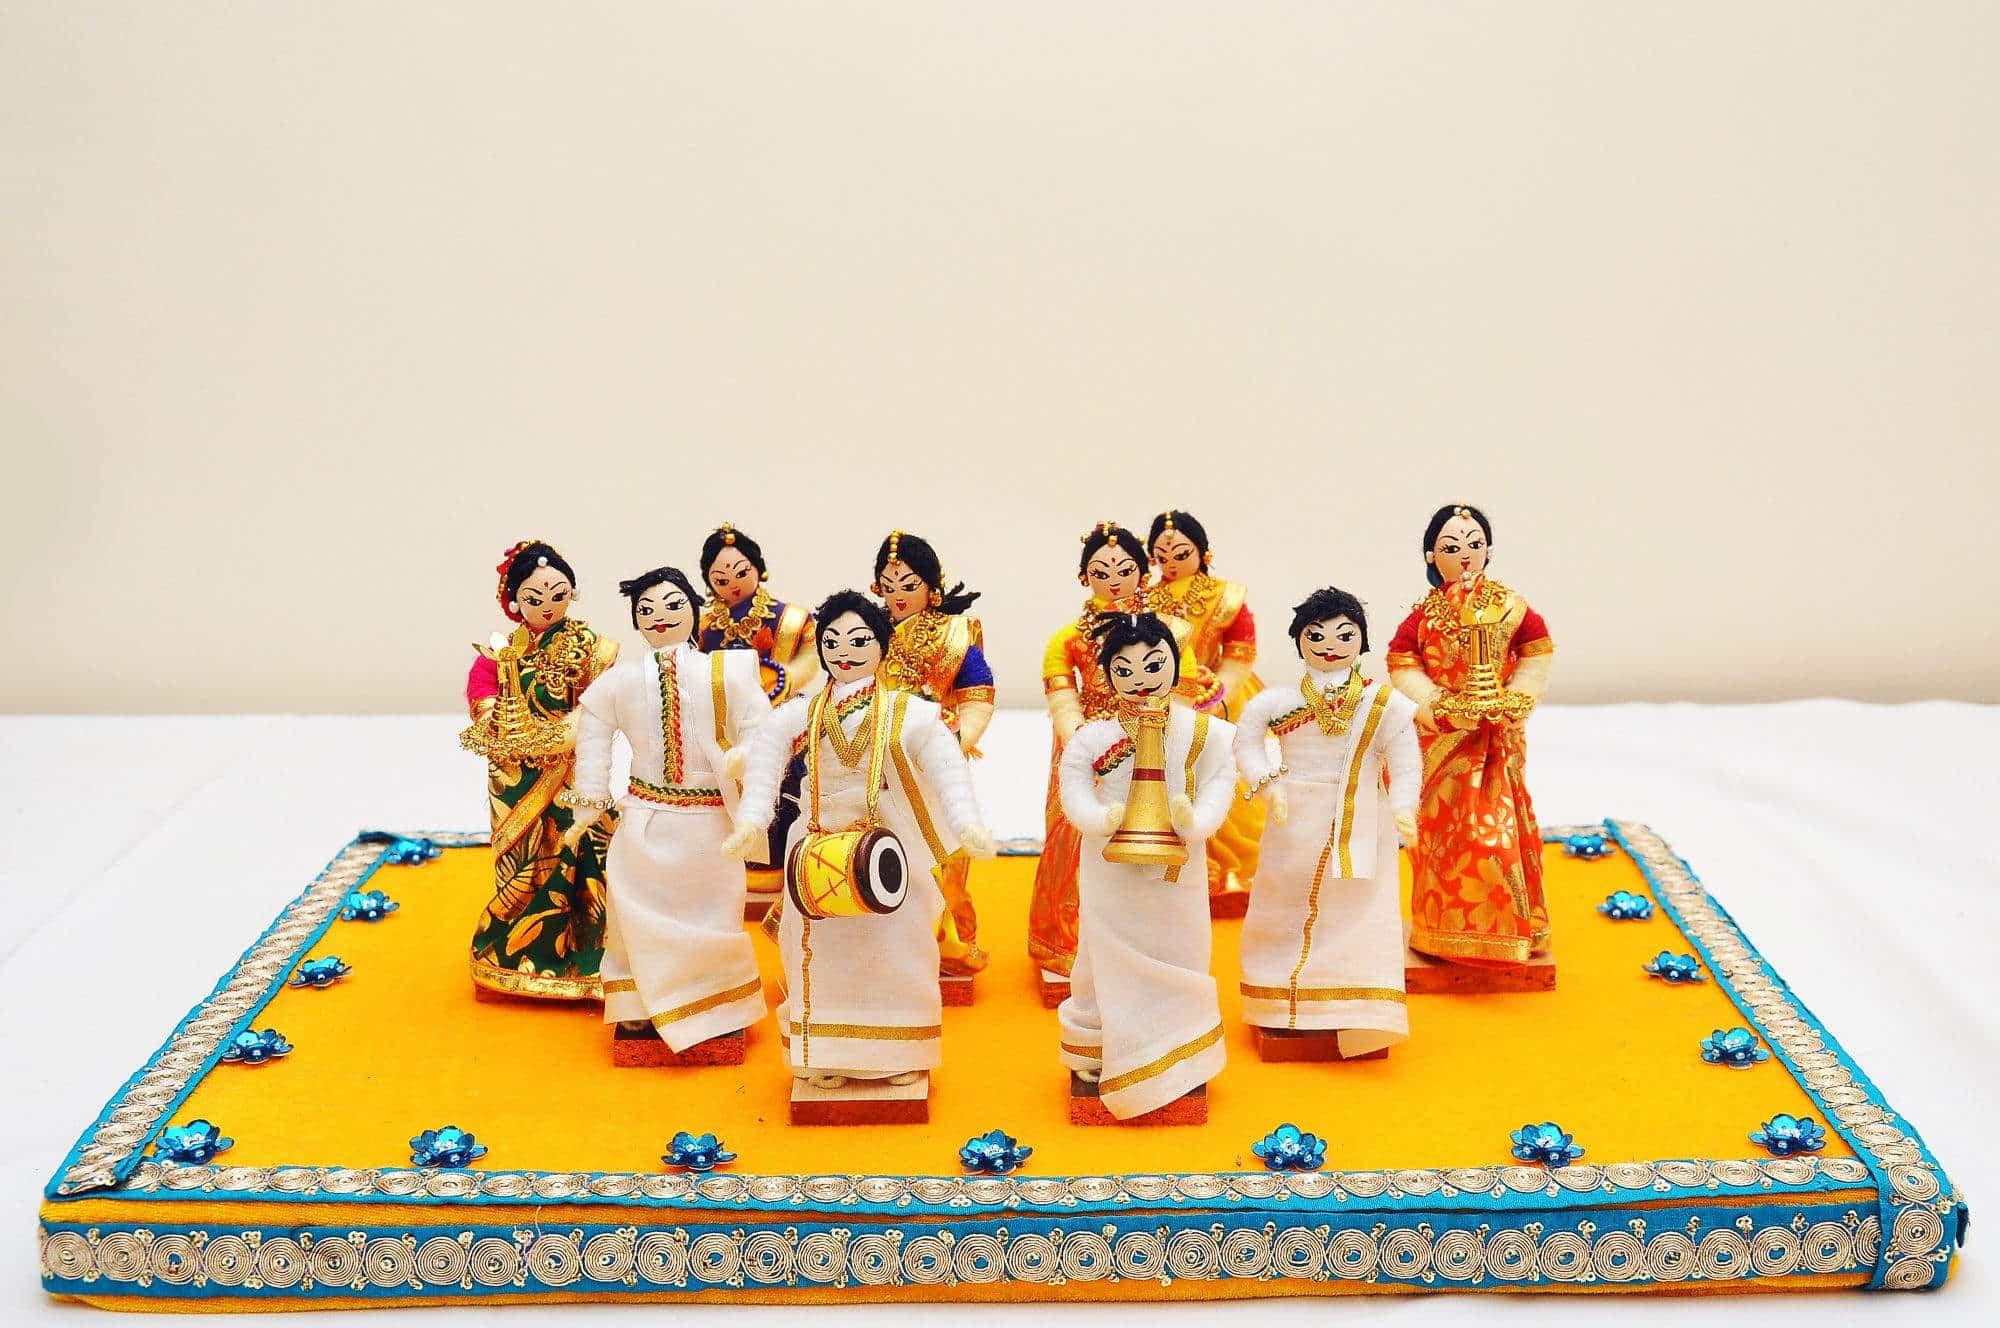 Sri Sai Plate Decoration Avinashi Taluk Decorators In Tirupur